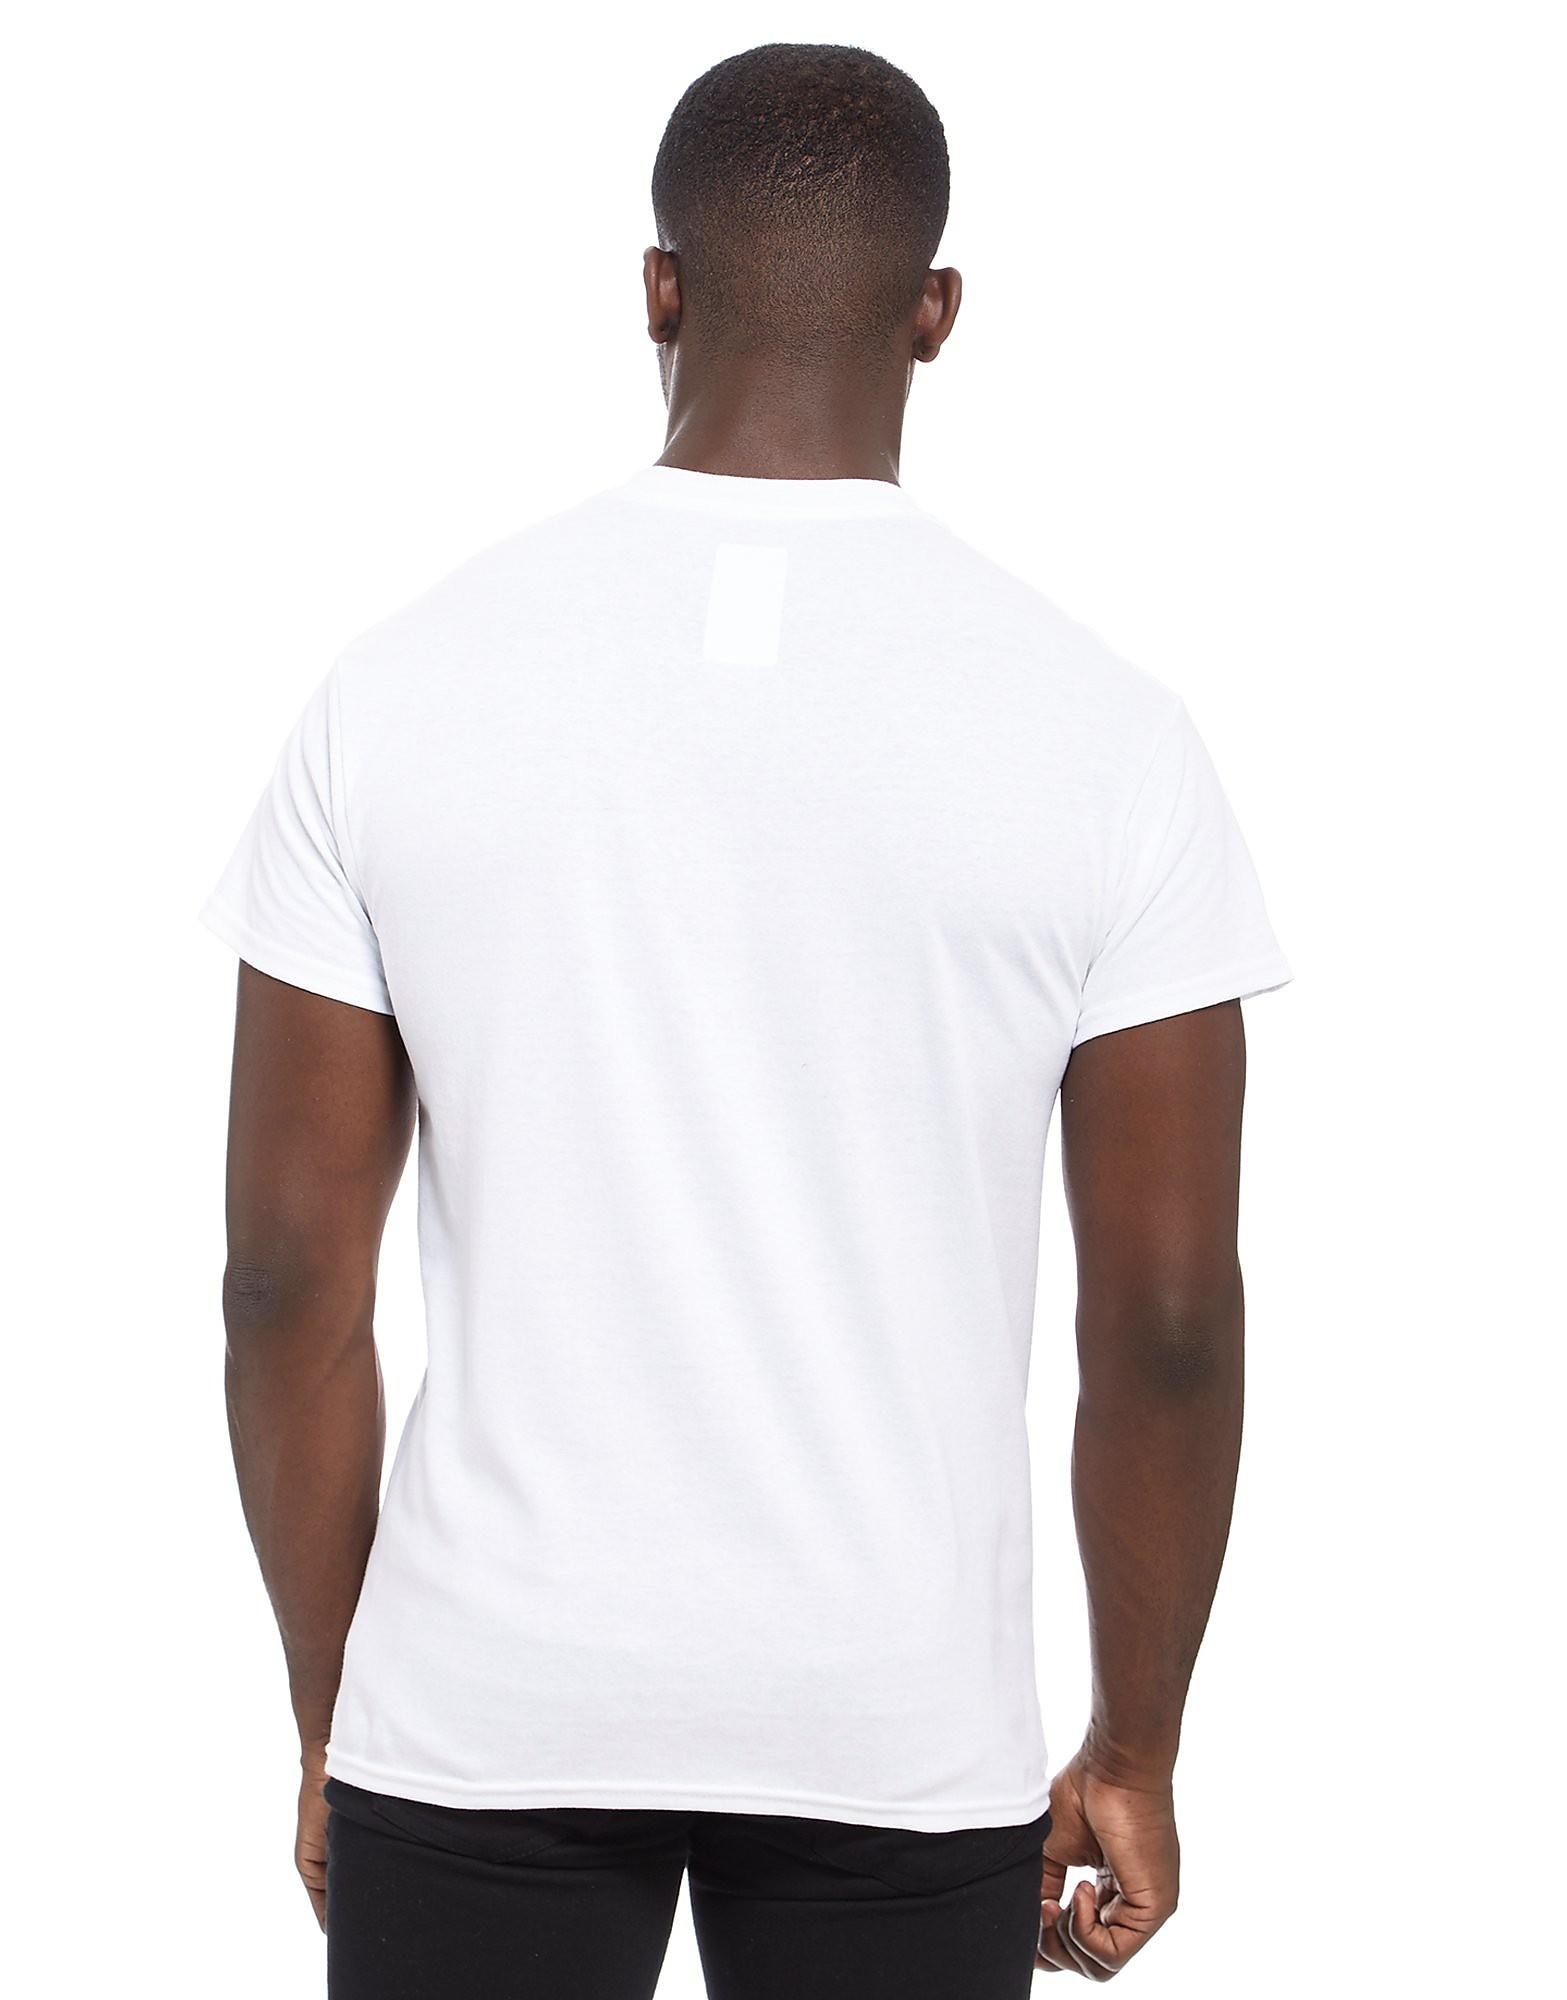 "SOURCE LAB LTD Tottenham Hotspur ""To Dare"" T-Shirt"